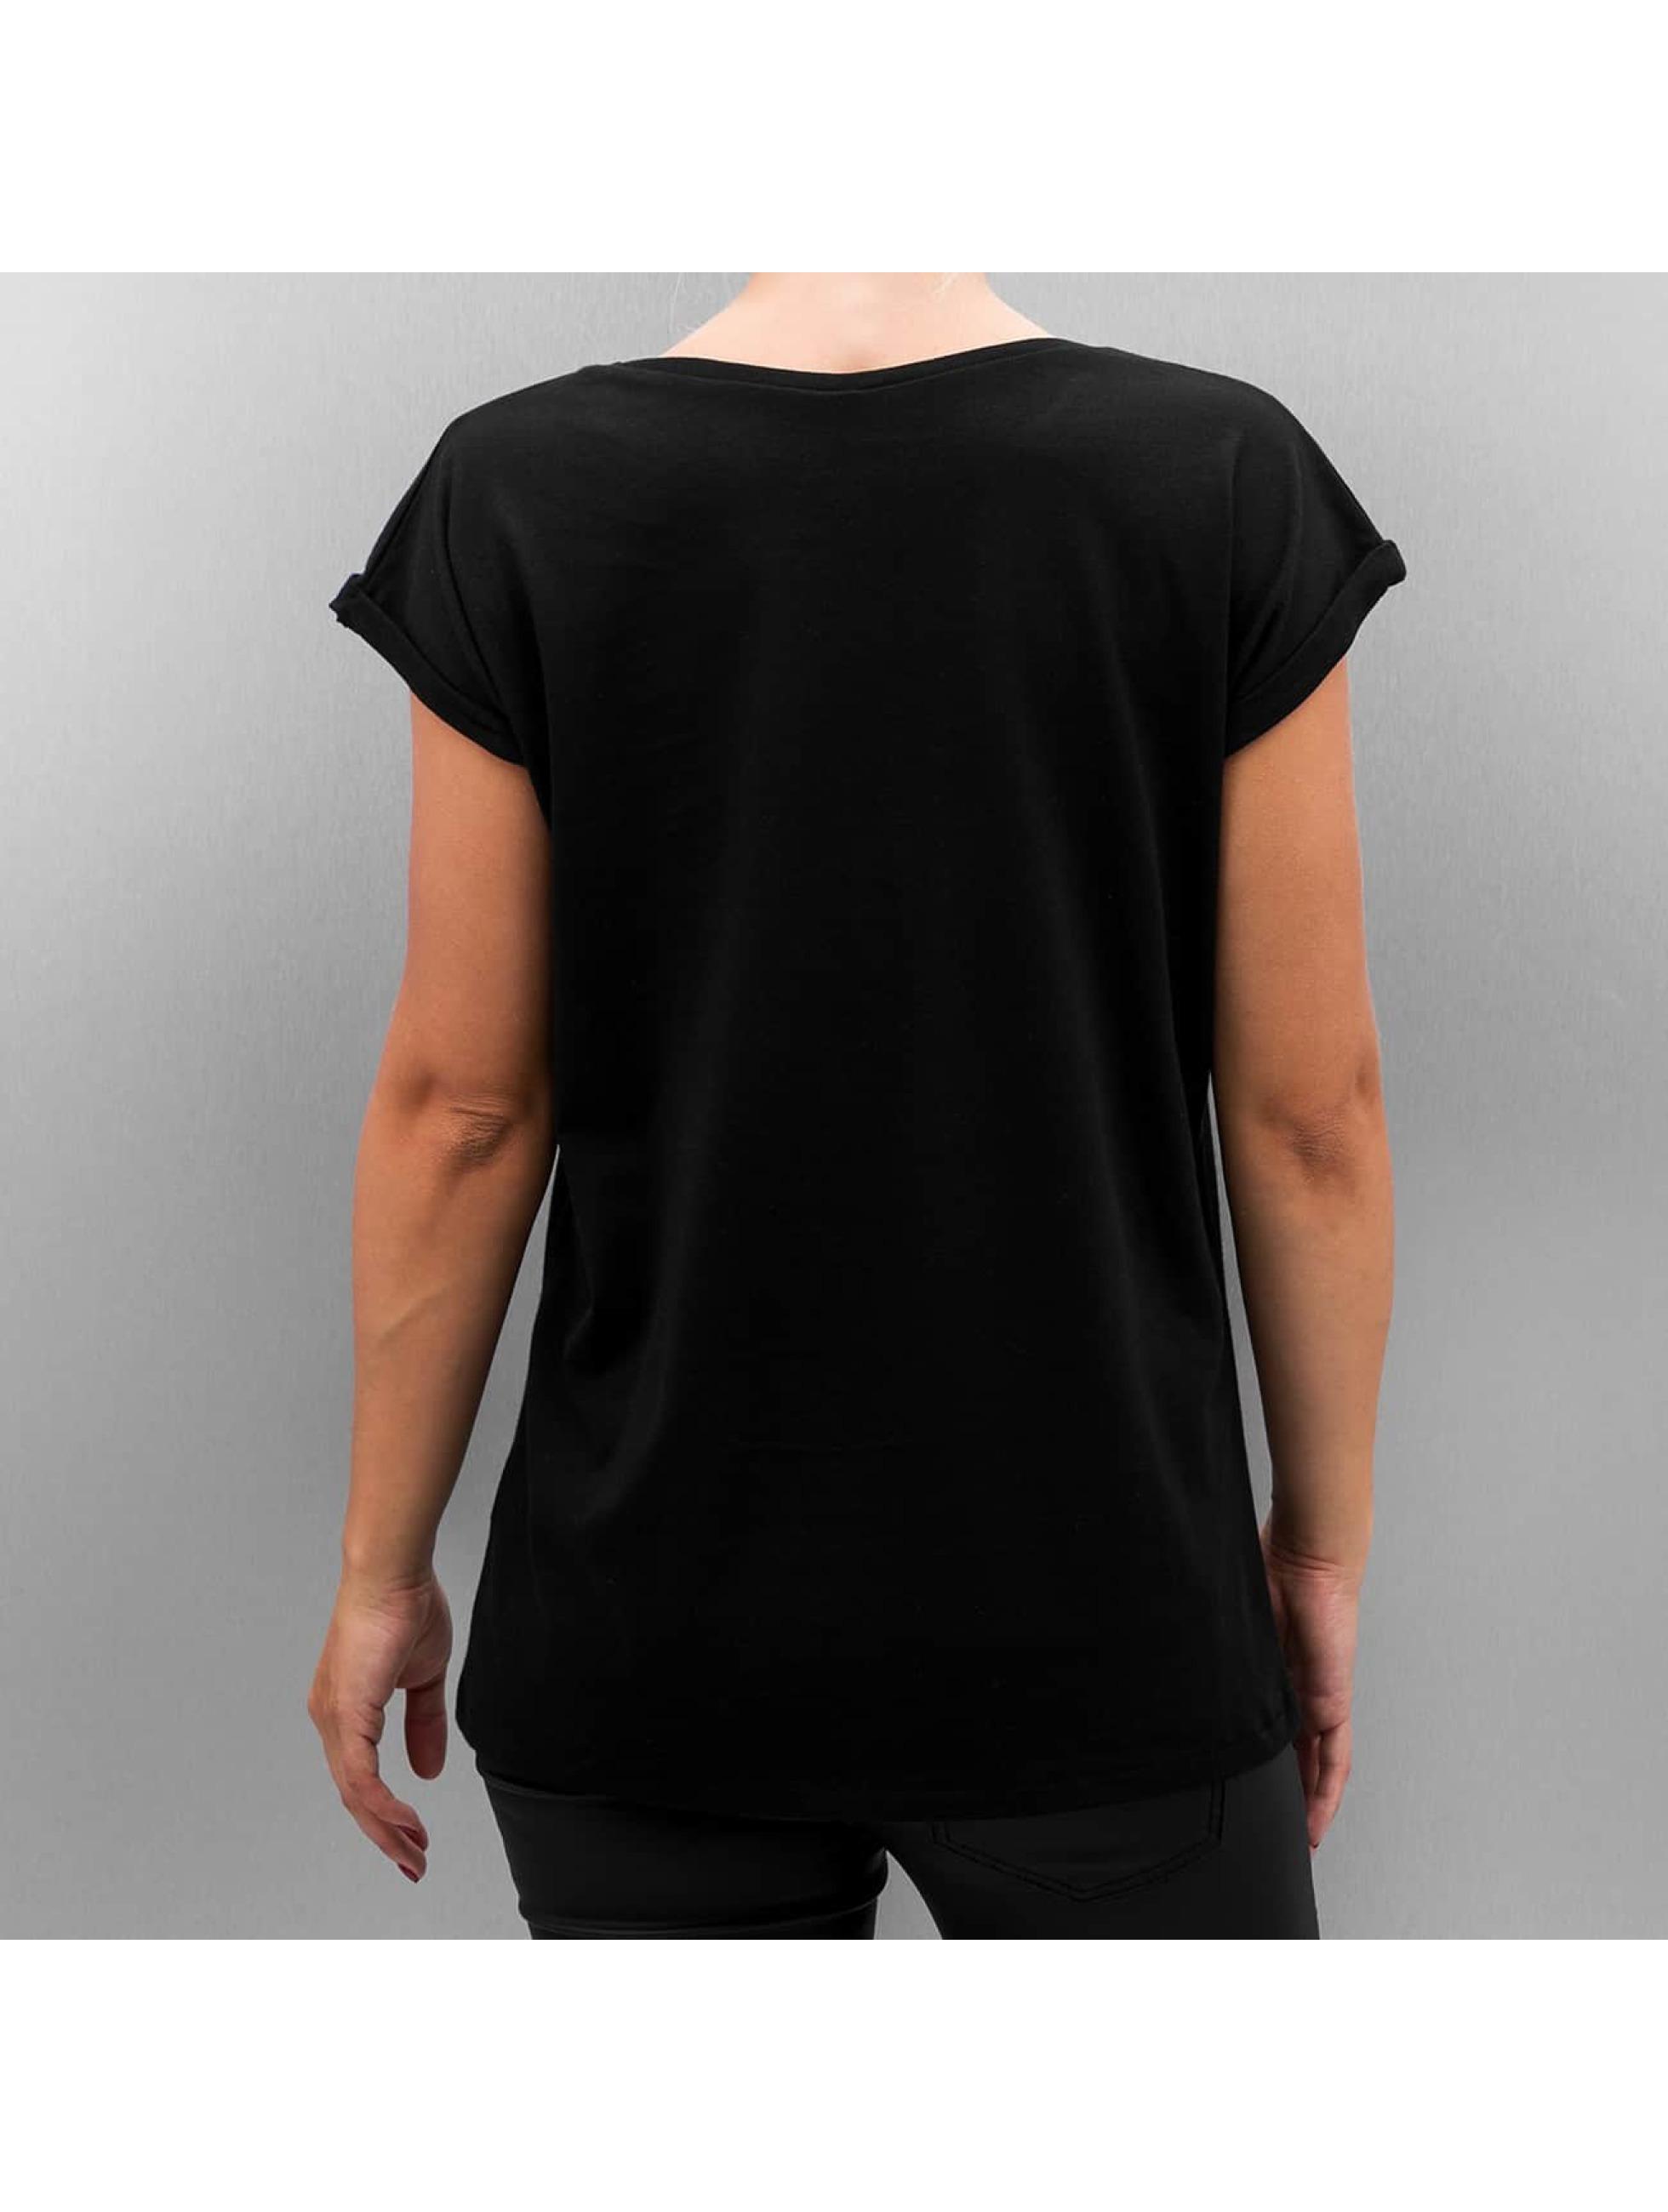 Mister Tee T-shirt Ladies Twenty One Pilots Filler Bars nero